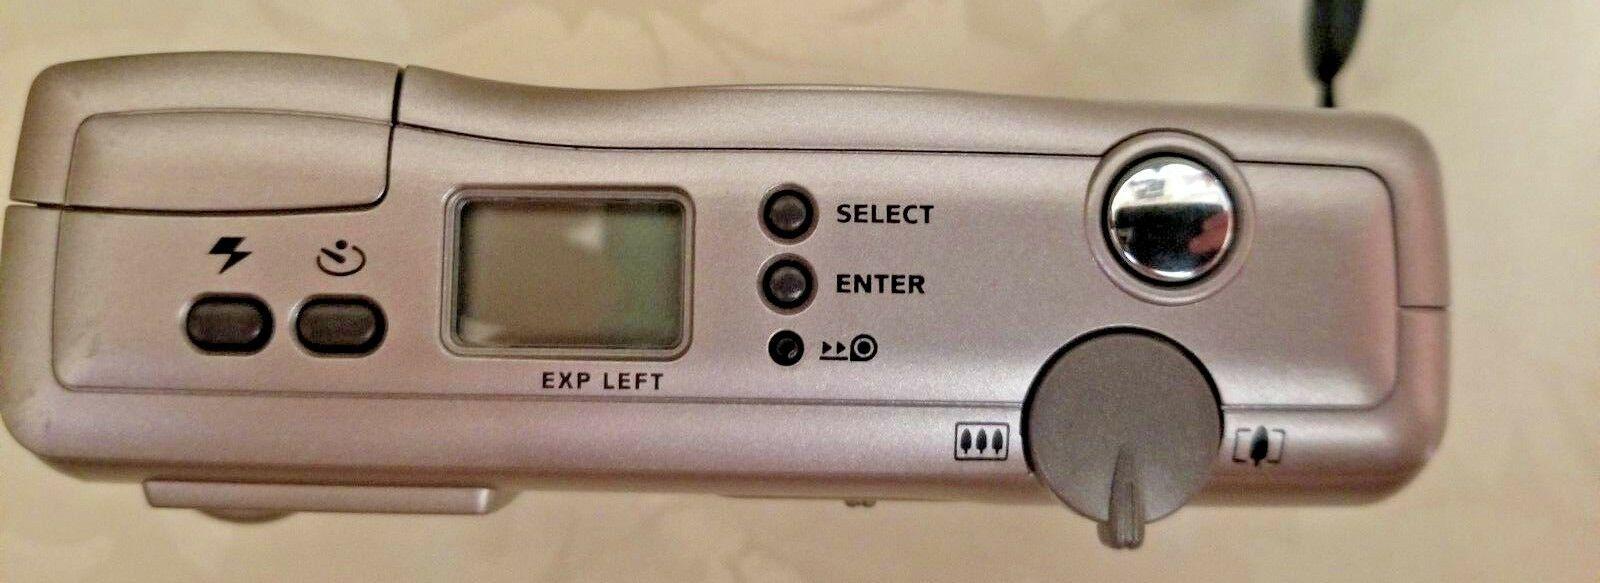 Kodak Advantix C650 Zoom APS Point & Shoot Film Camera image 4